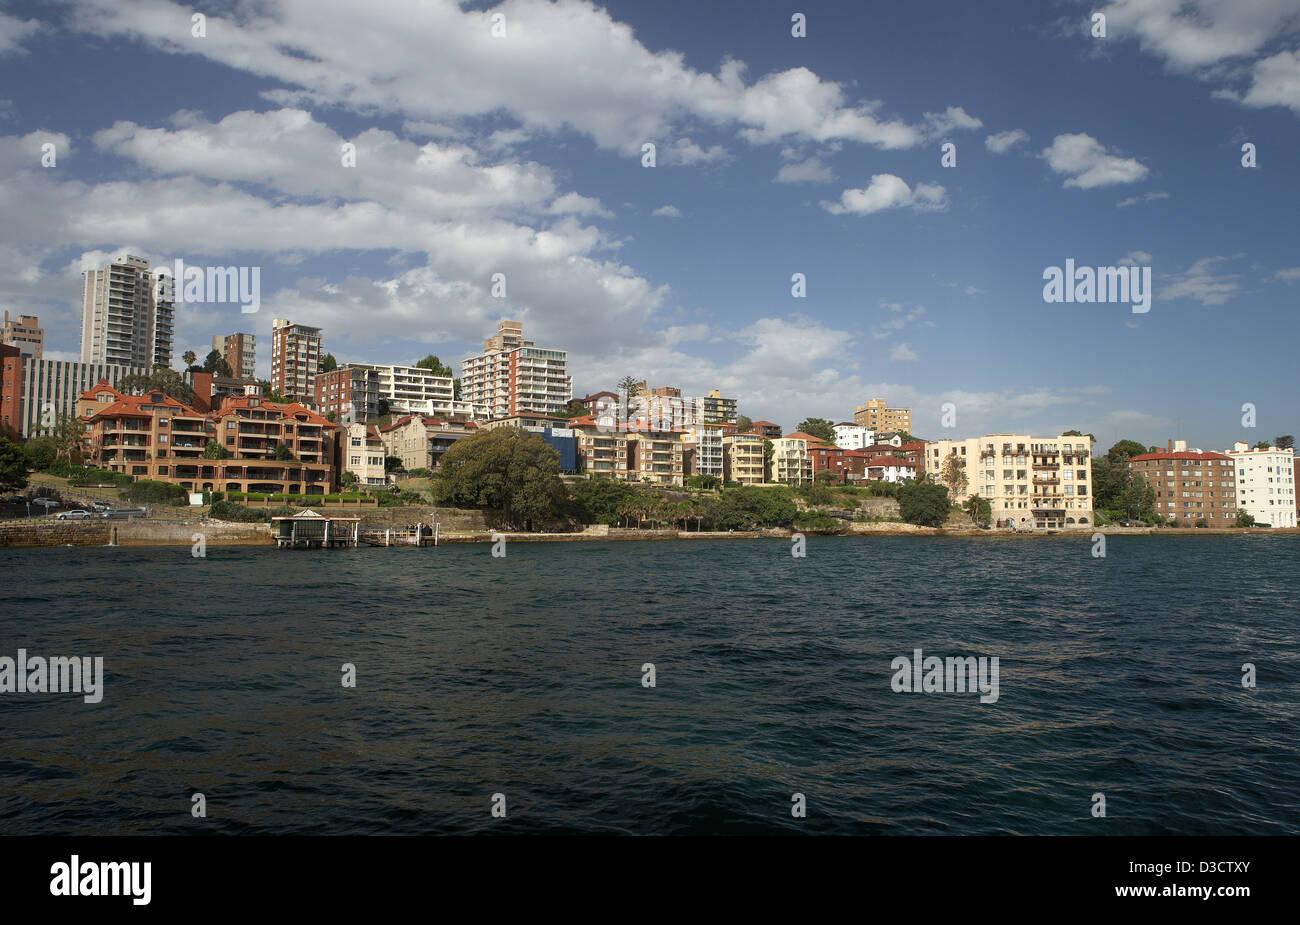 Sydney, Australia, the suburb of Kirribilli seen from a Hafenfaehre - Stock Image